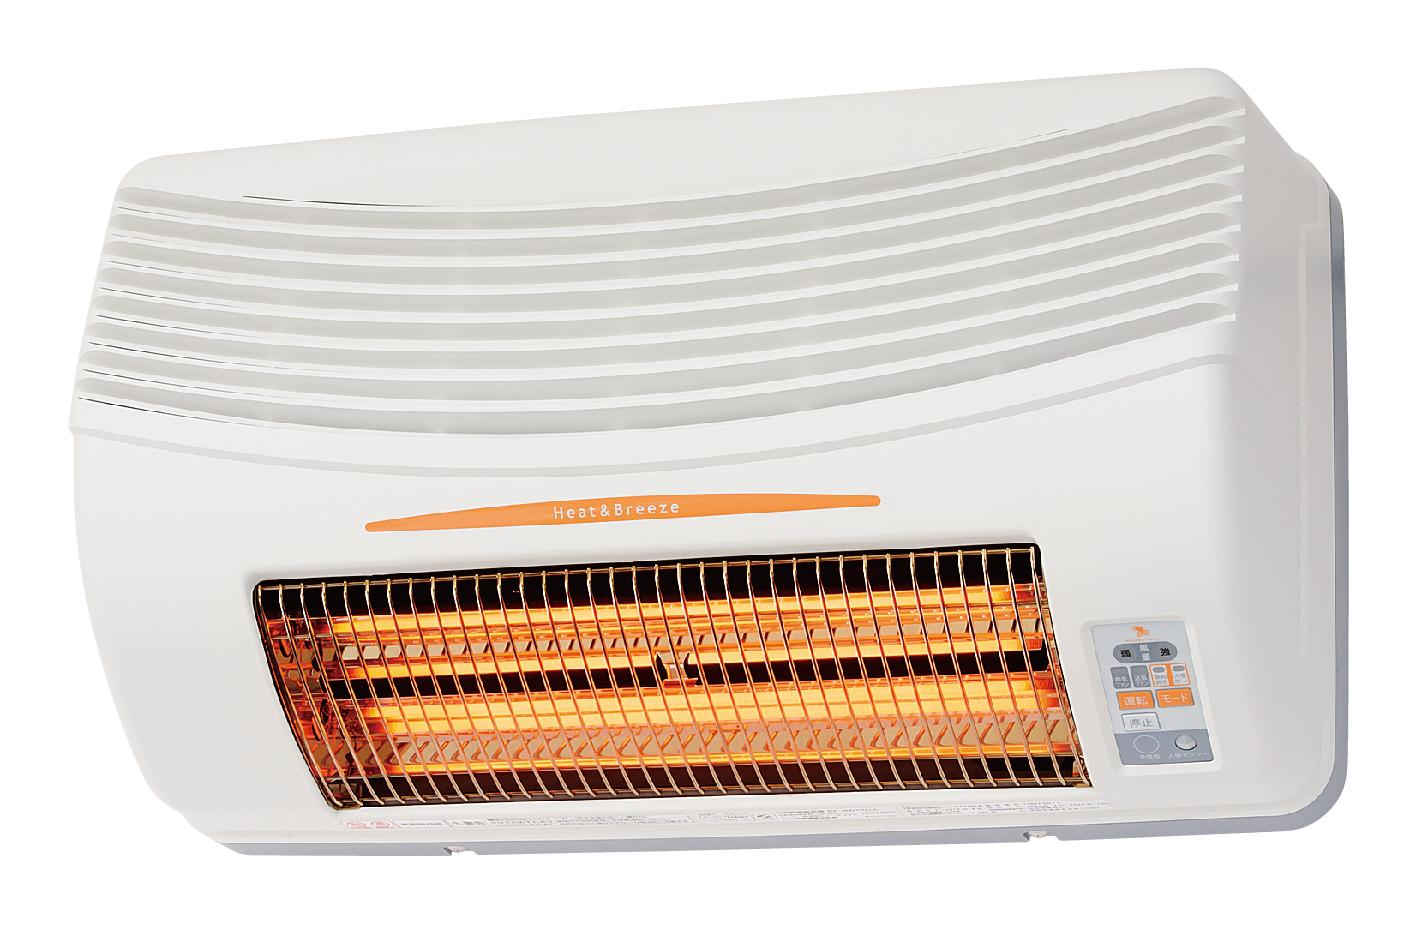 TSK(高須産業)浴室換気乾燥暖房機(標準タイプ)BF-861RGA